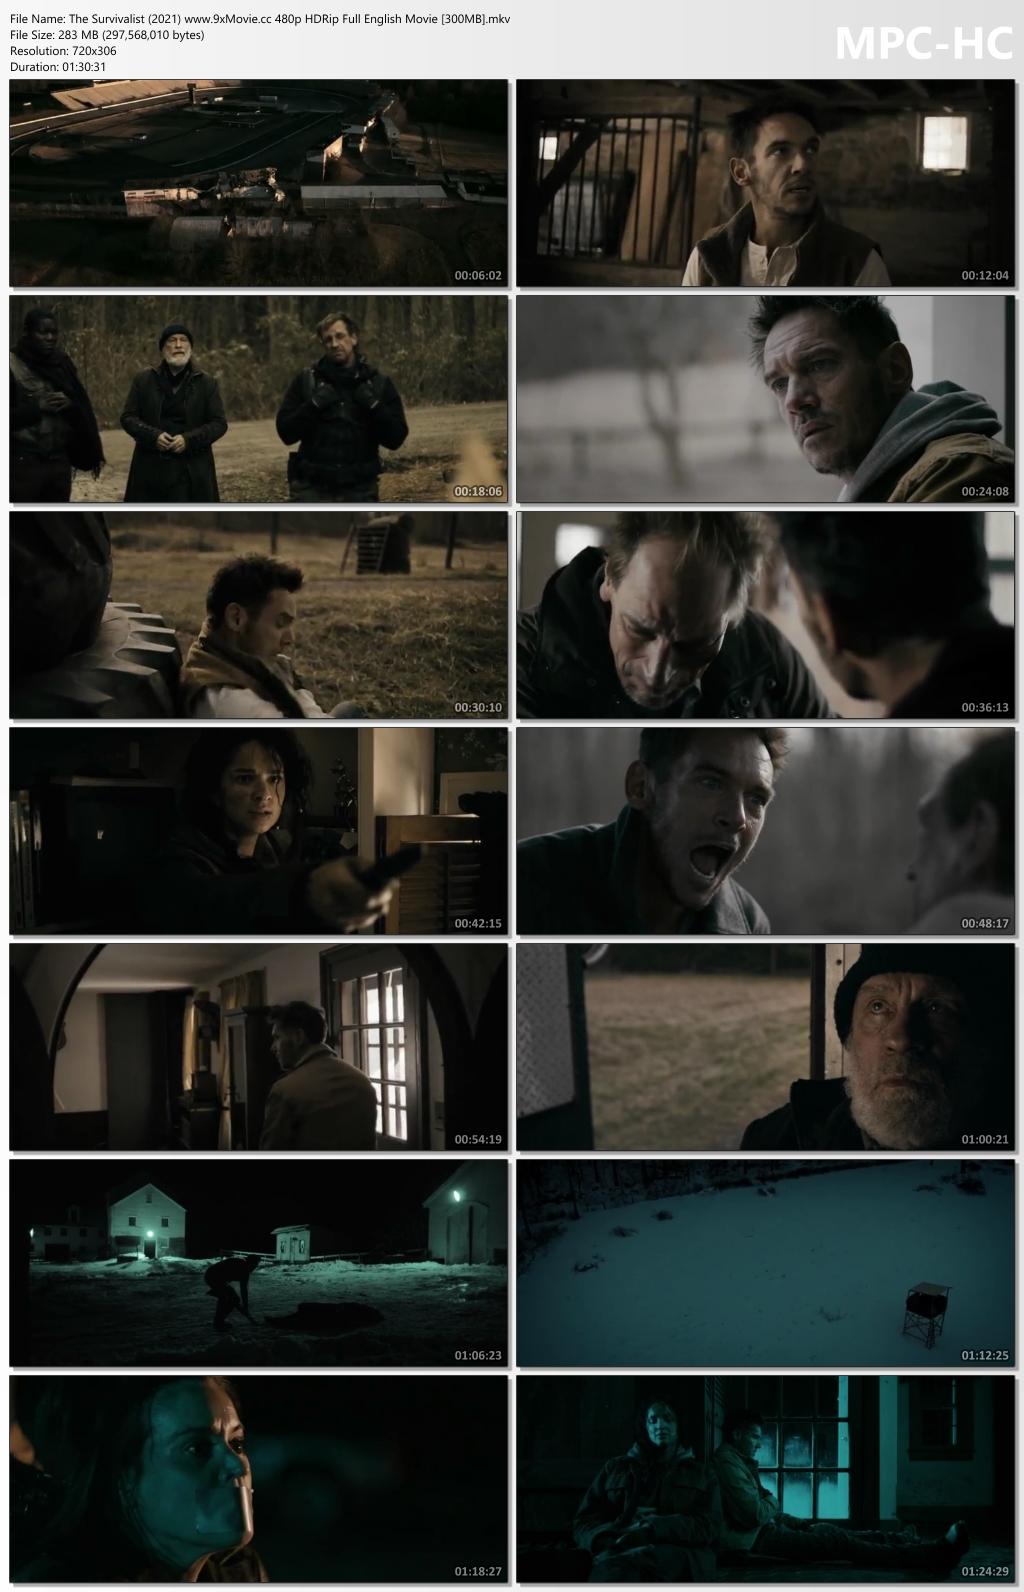 The-Survivalist-2021-www-9x-Movie-cc-480p-HDRip-Full-English-Movie-300-MB-mkv